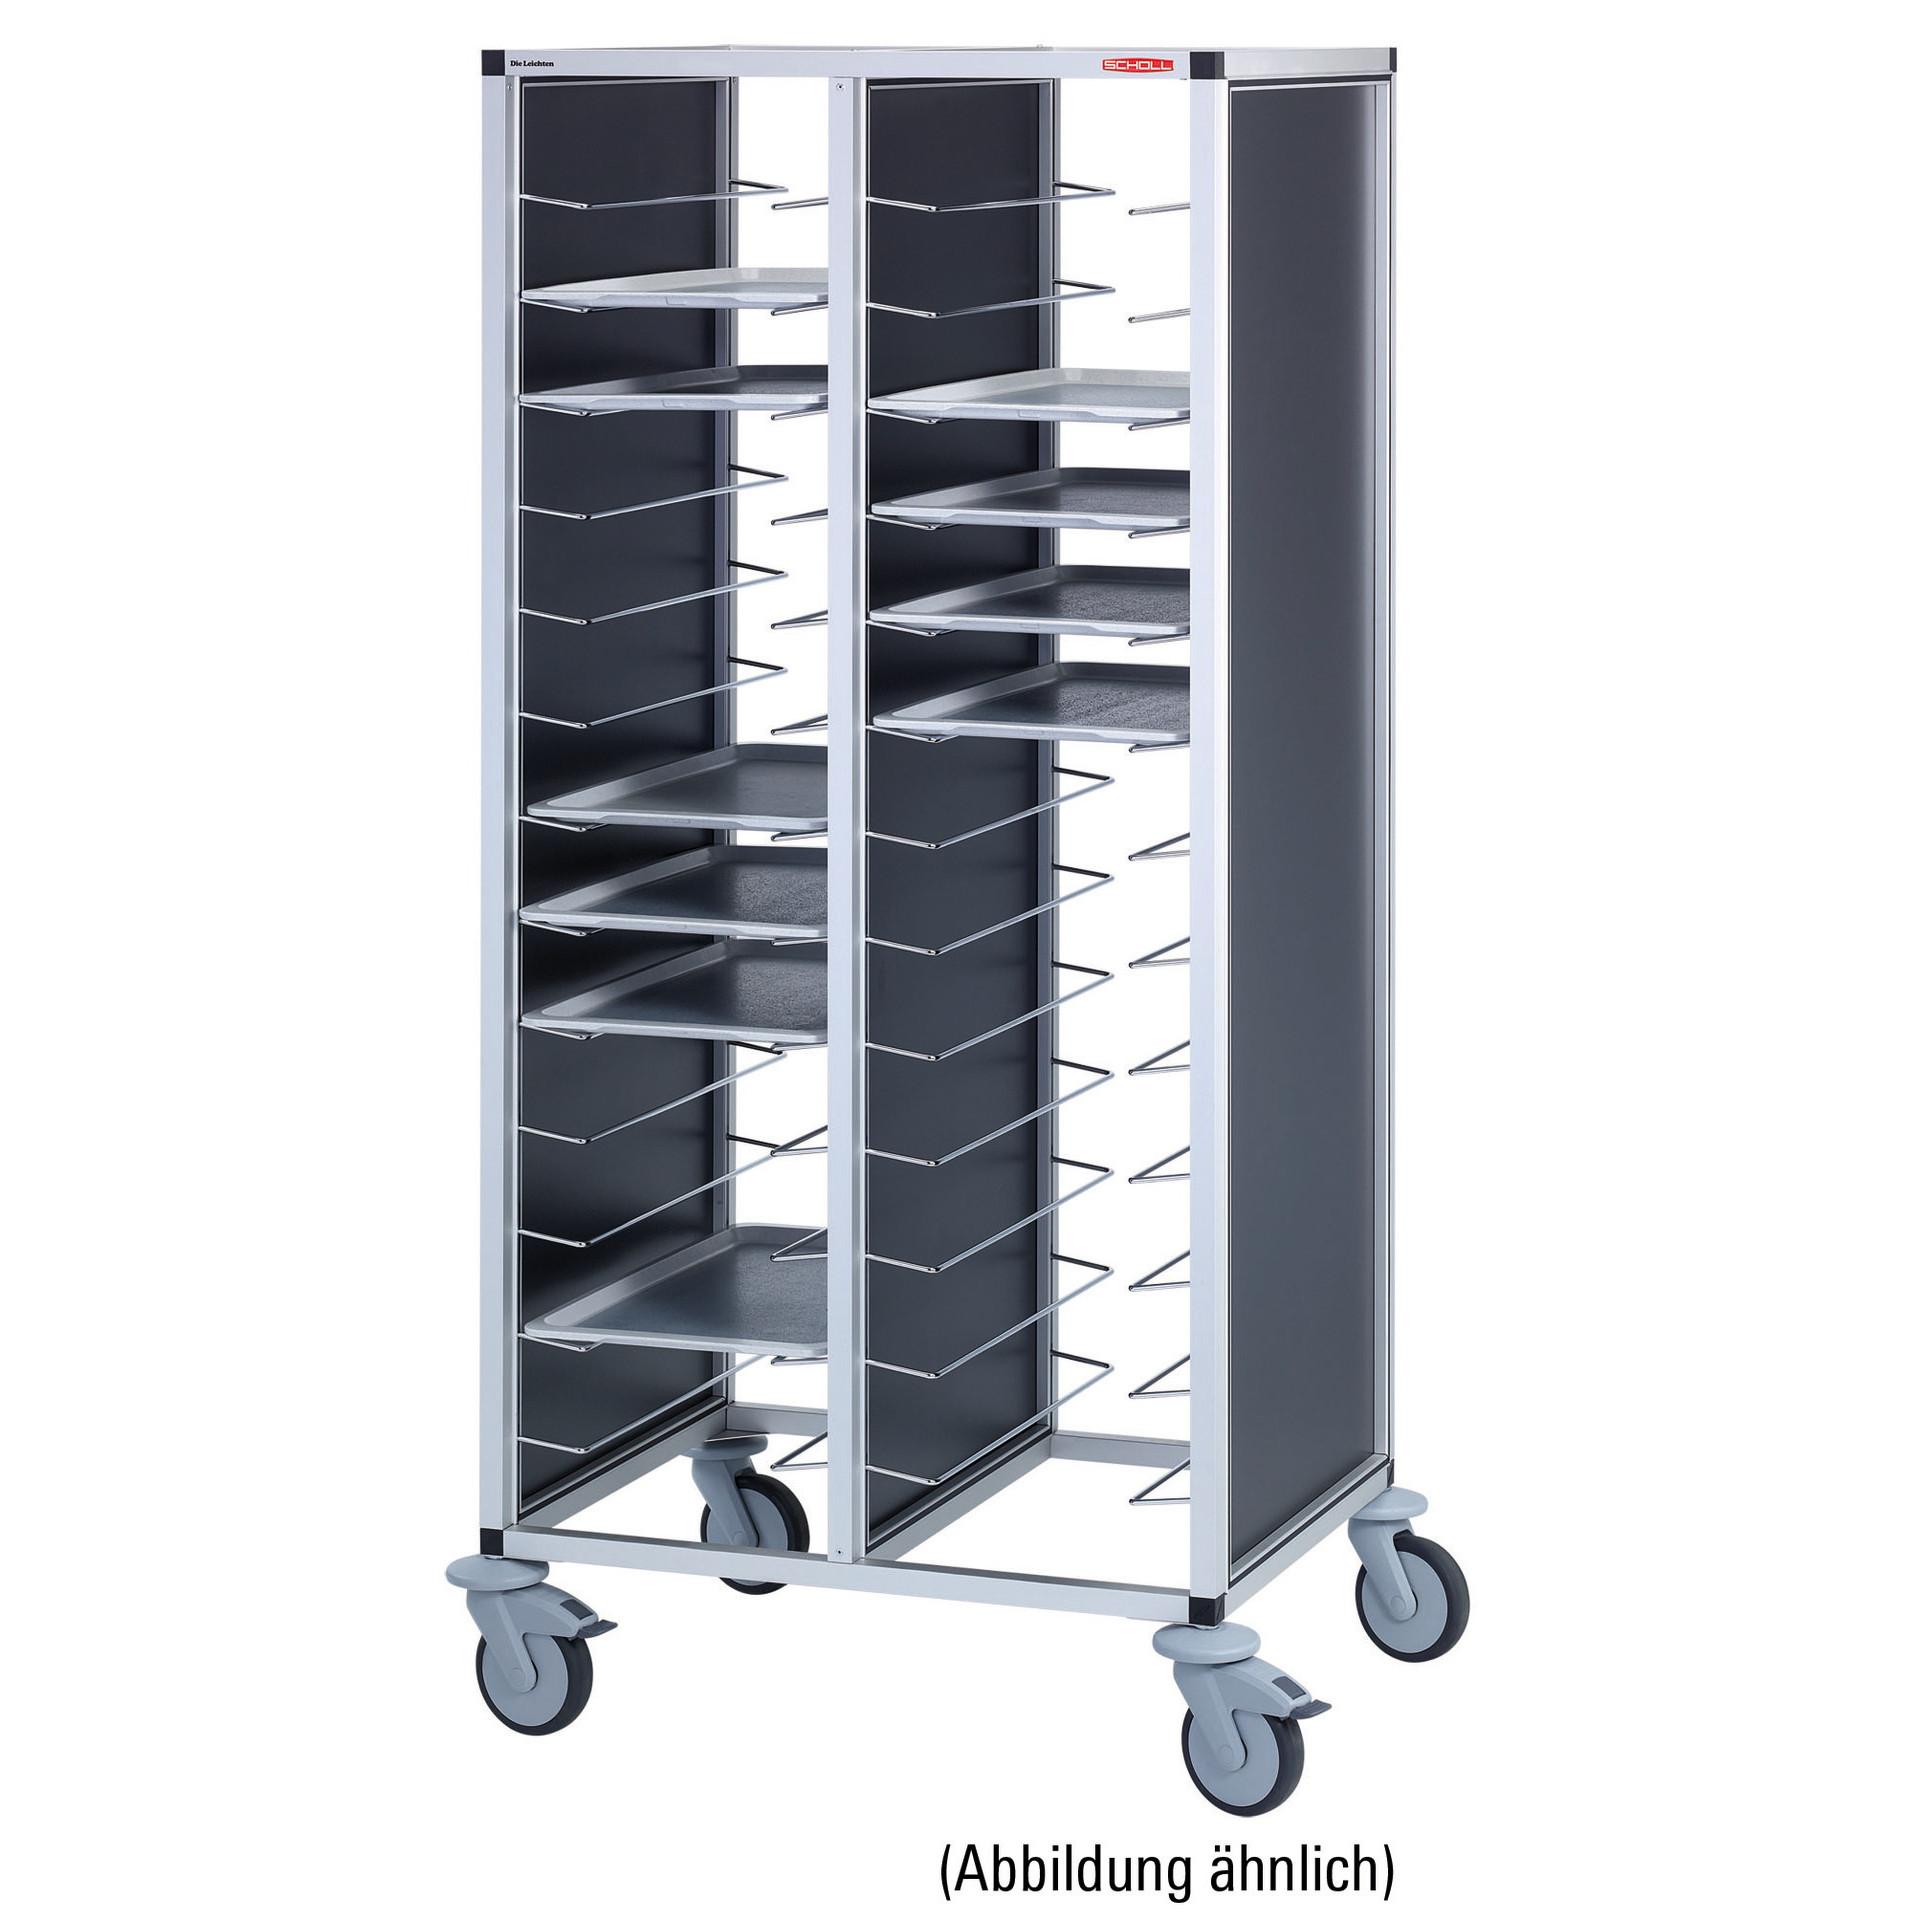 Tablett-Abräumwagen 2-teilig / für 44 GN-Tabletts / 100 mm Abstand